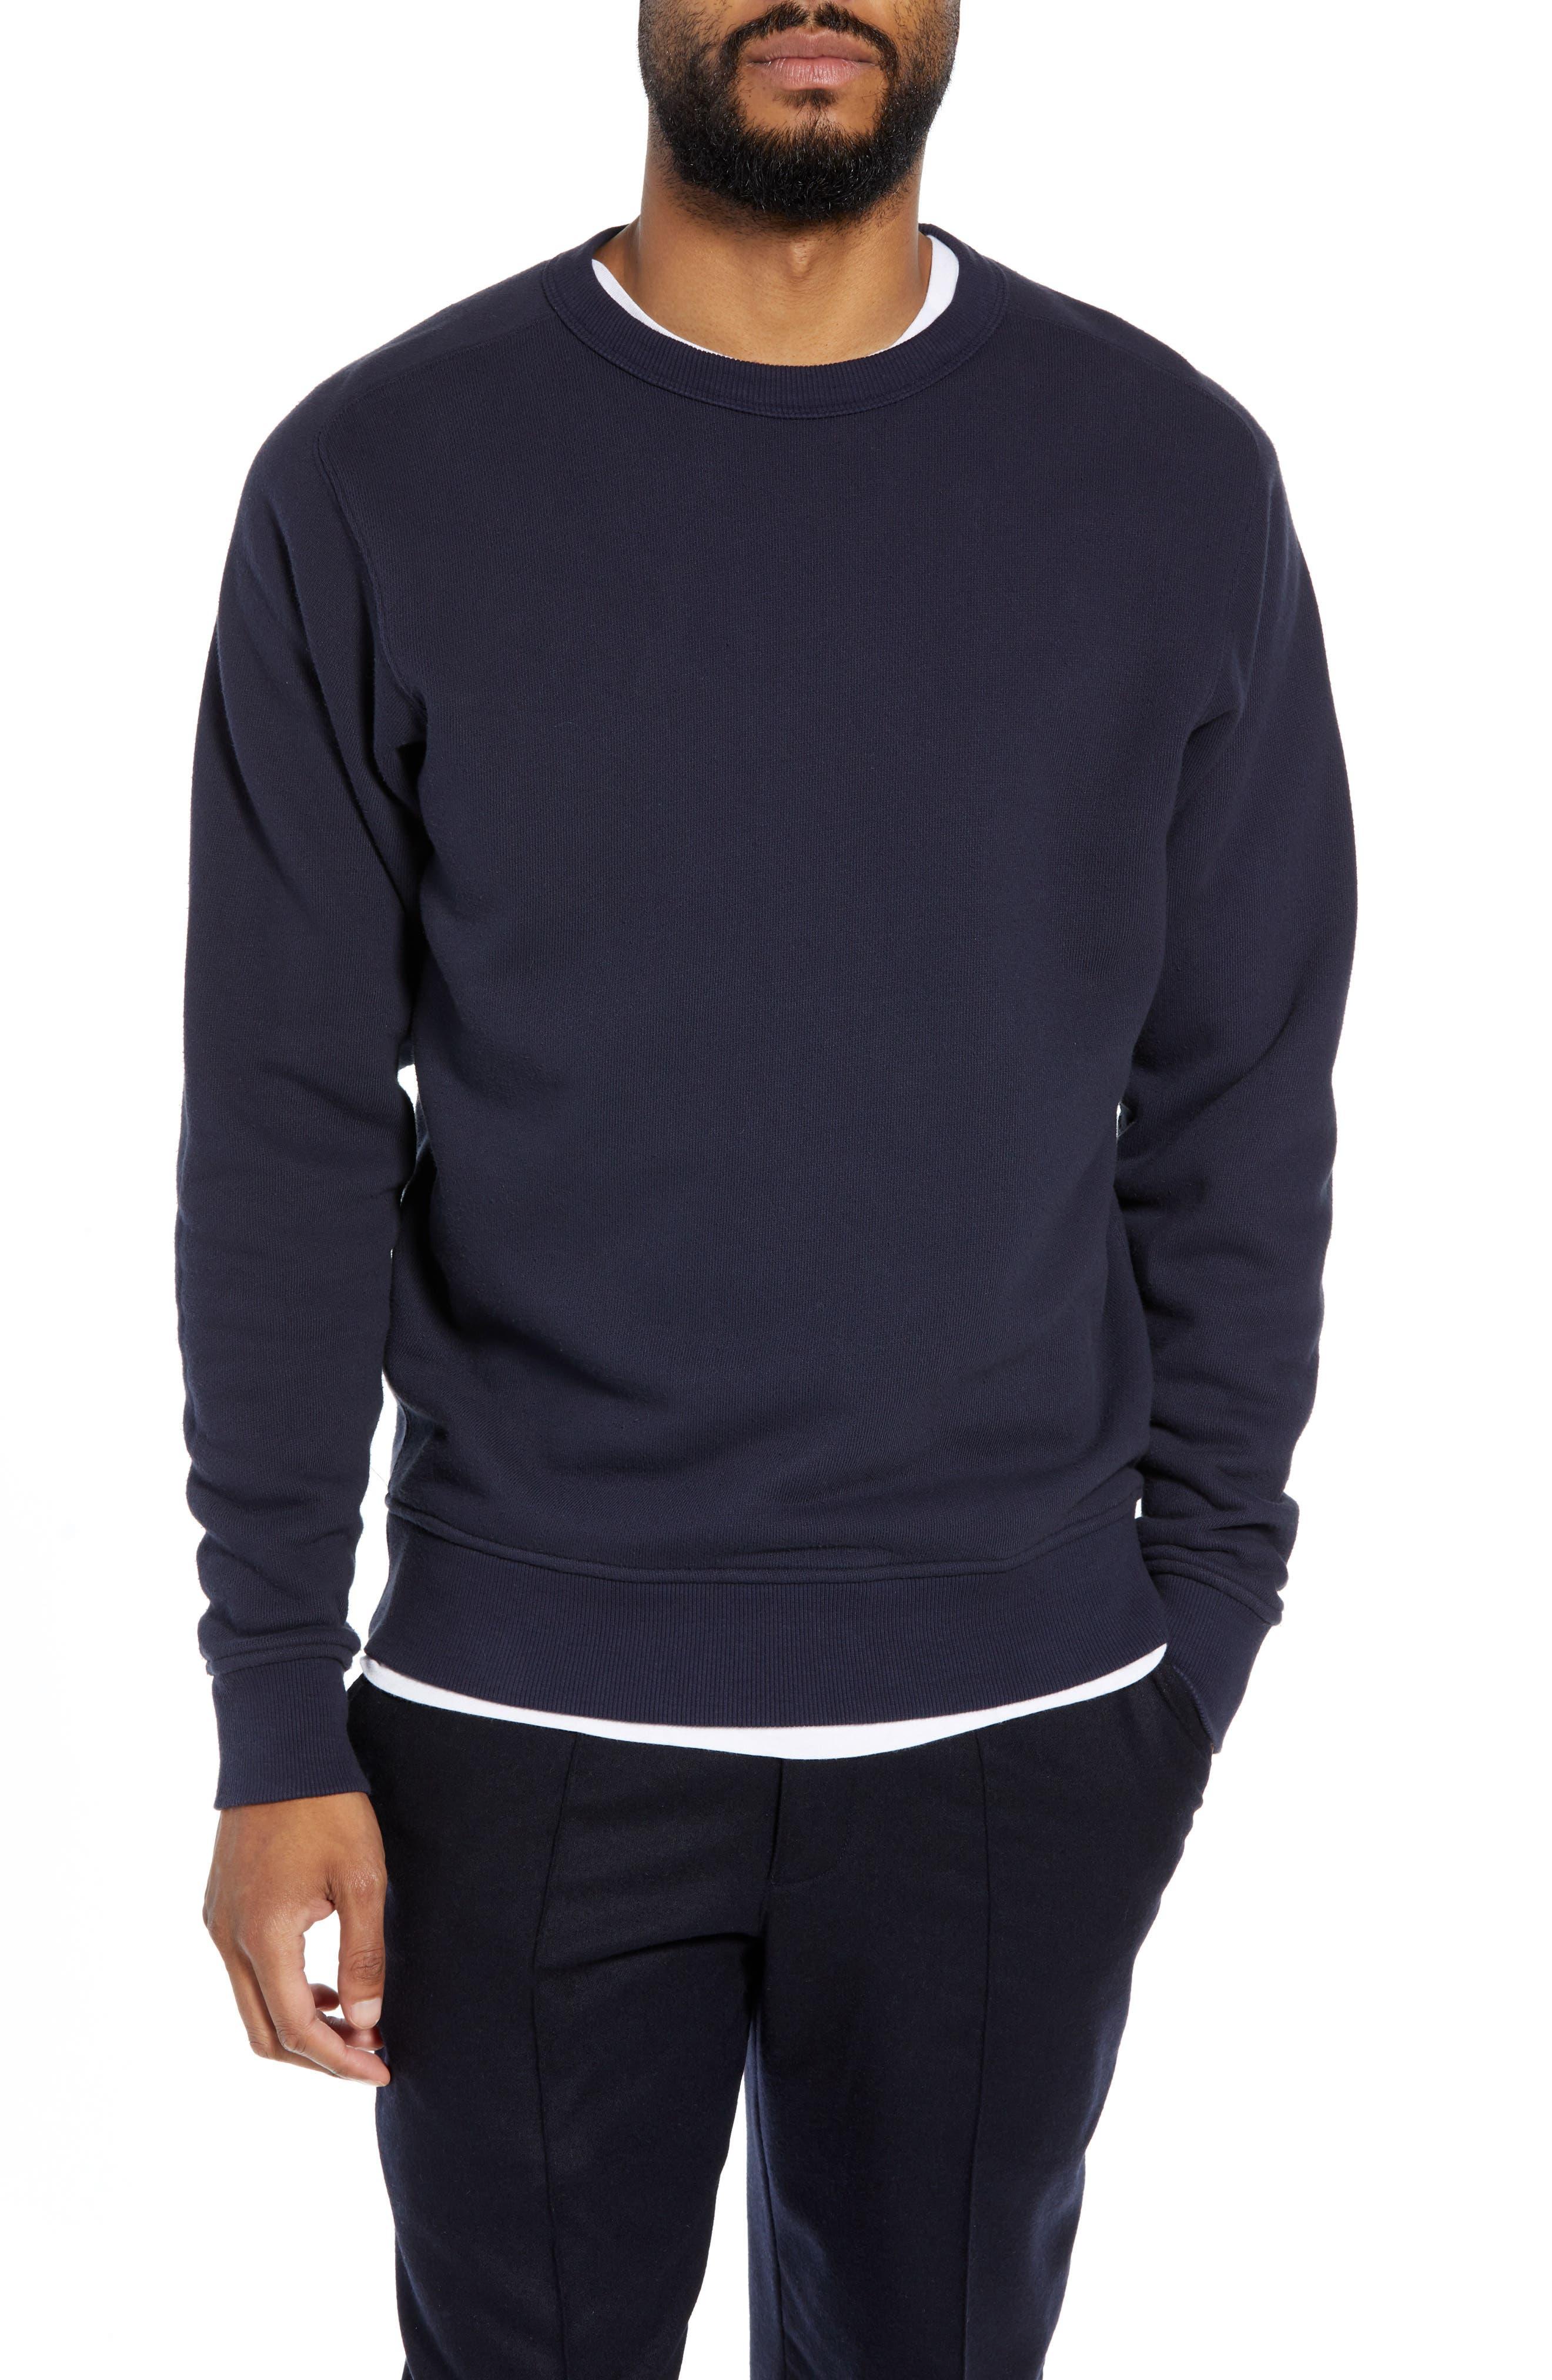 Almost Grown Crewneck Sweatshirt,                             Main thumbnail 1, color,                             NAVY